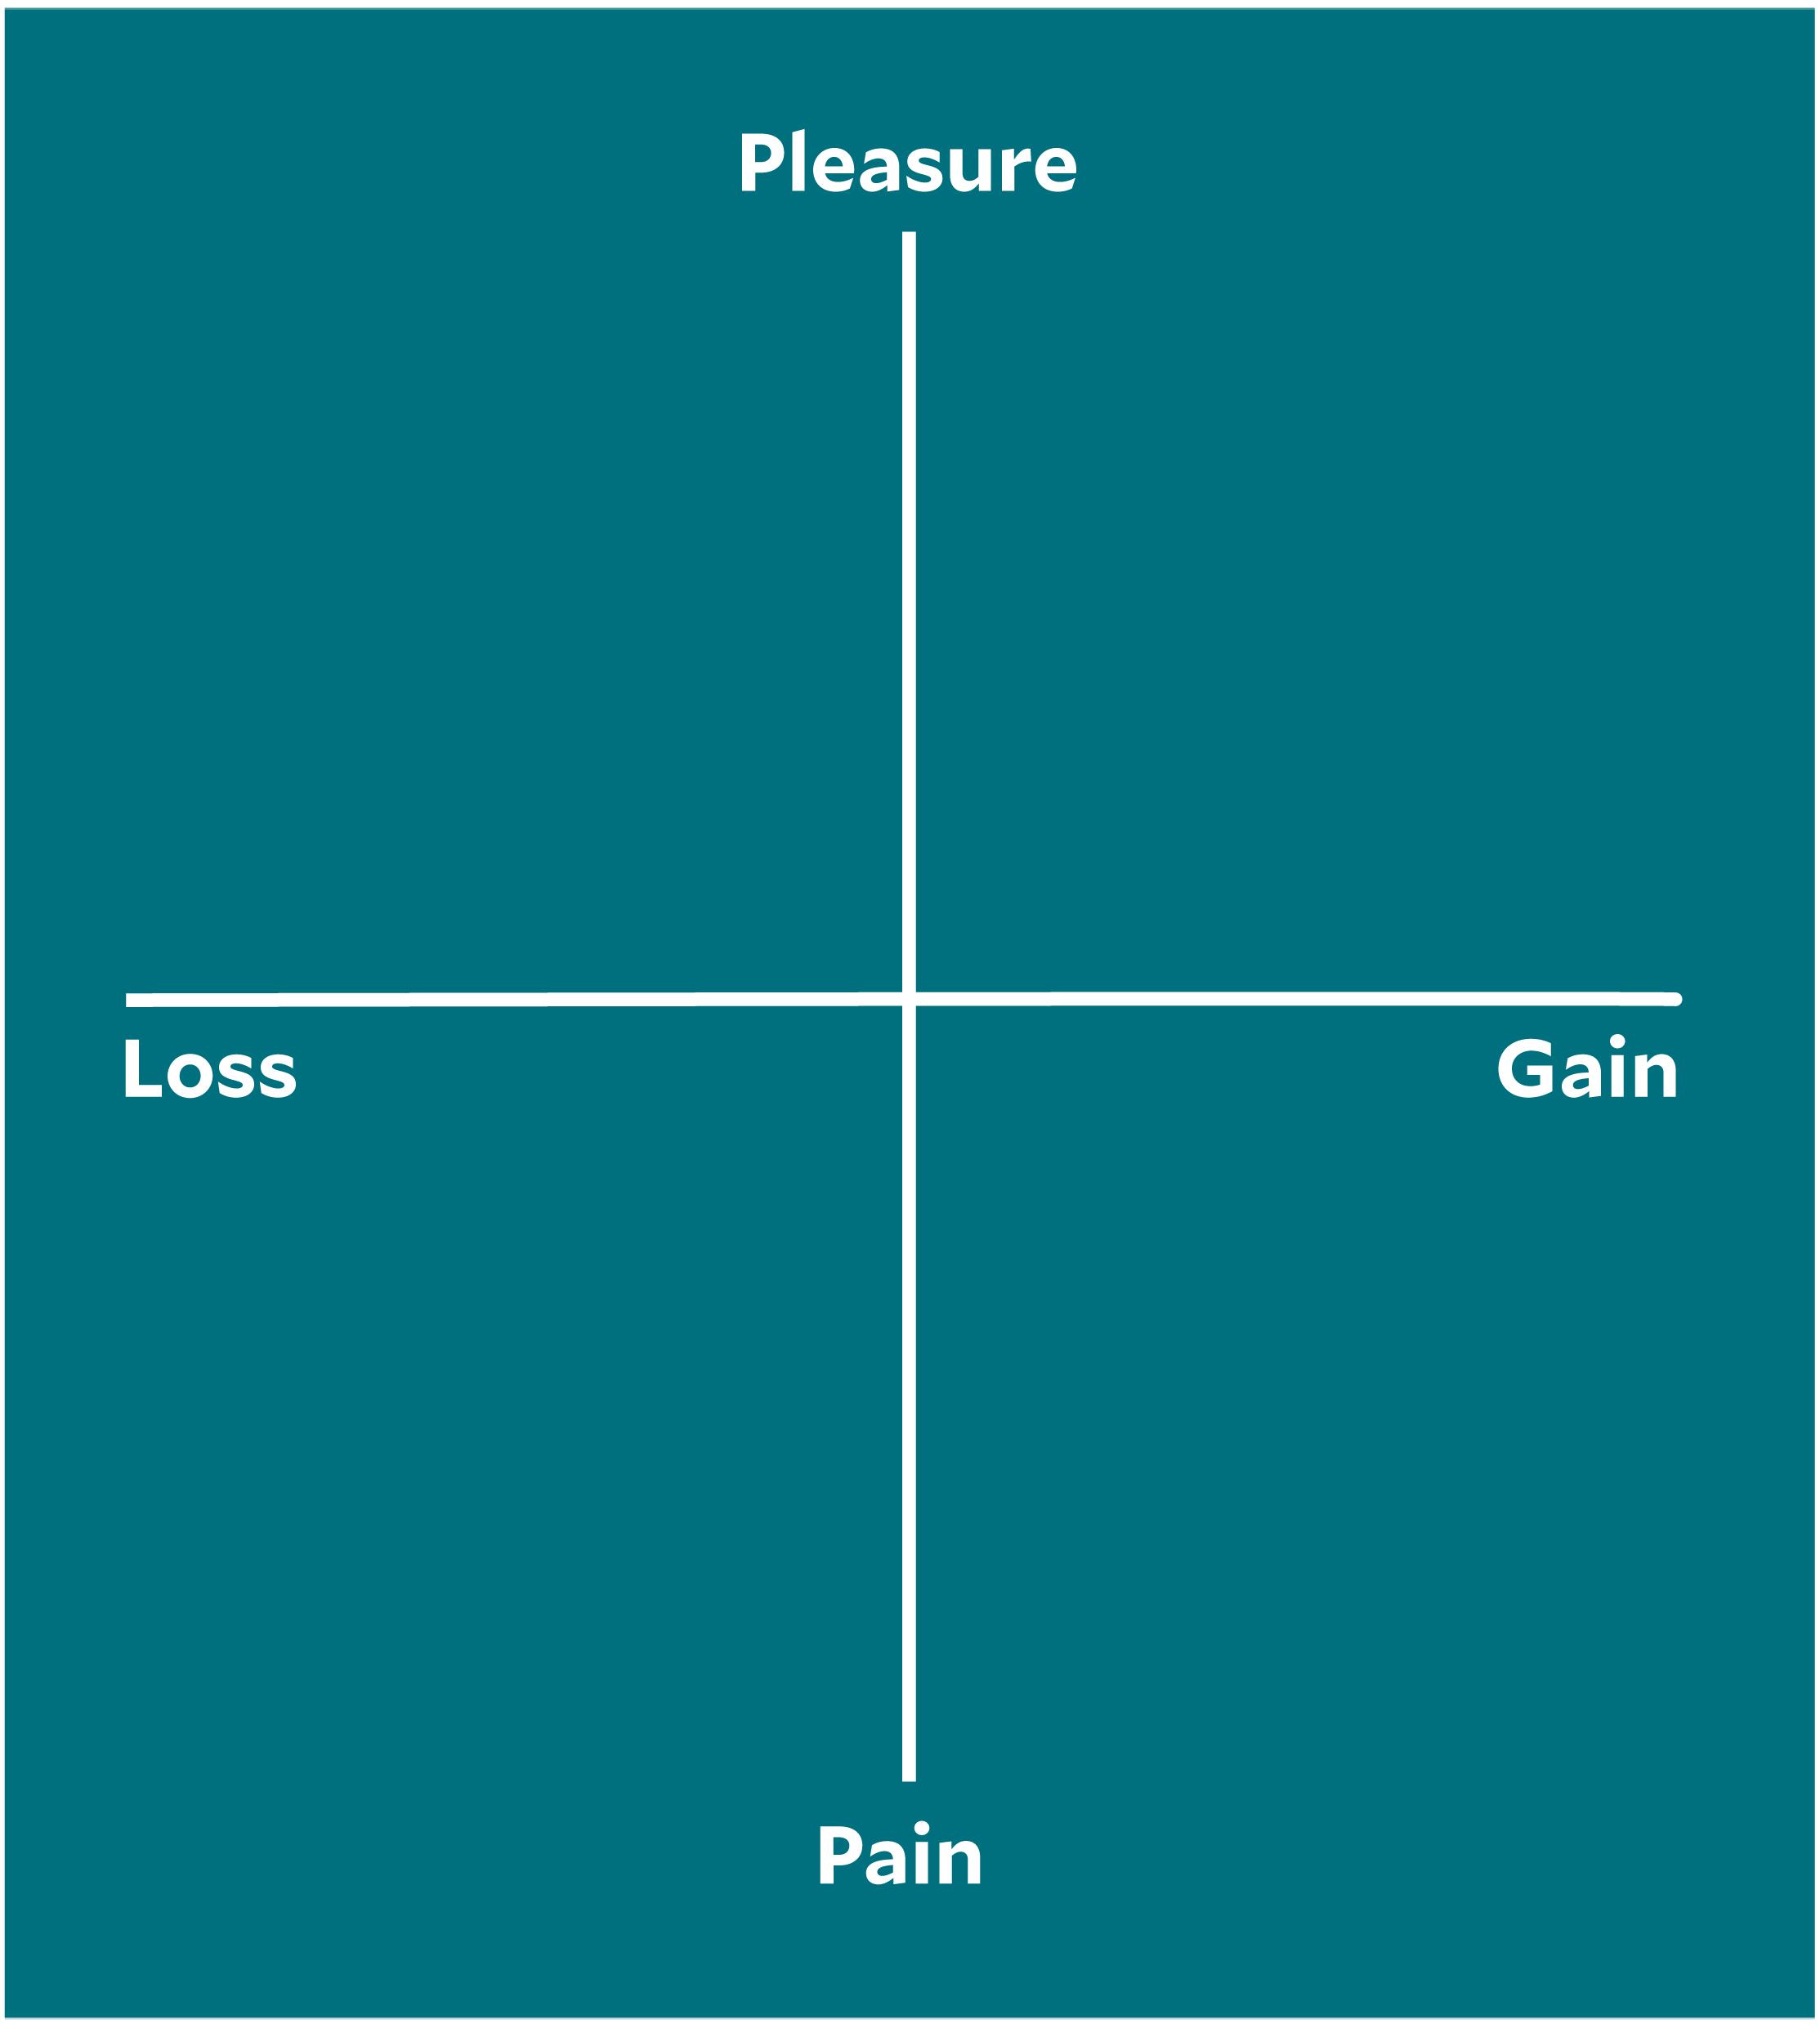 pleasure and gain sprint retrospective idea